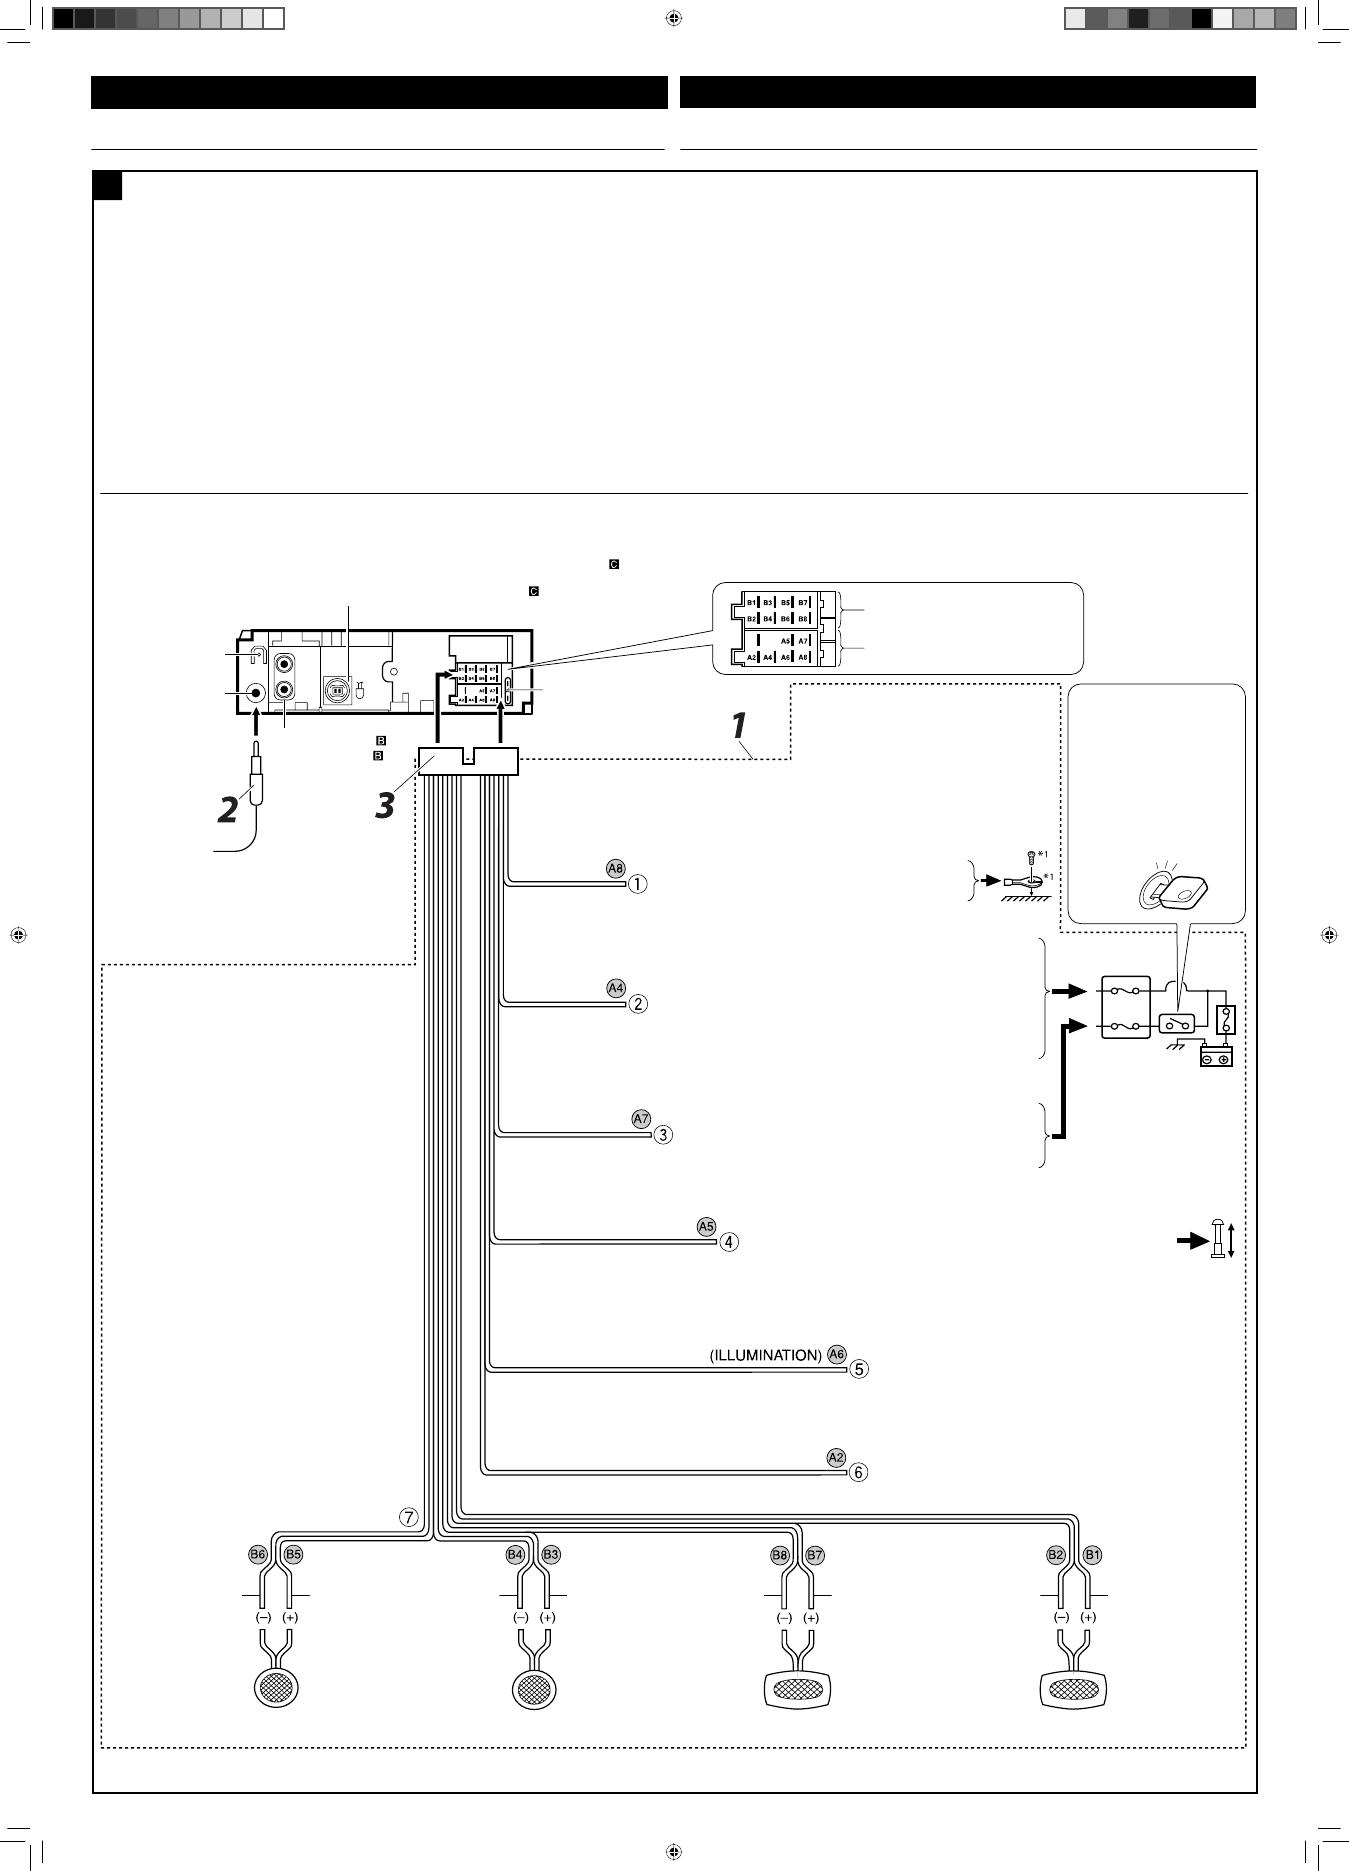 02d071 Kenwood Kdc 152 Wiring Diagram Elegant Kenwood Kdc 352u Wiring Diagram20 Fitfathers Of Kenwood Kdc 152 Wiring Diagram Wiring Library